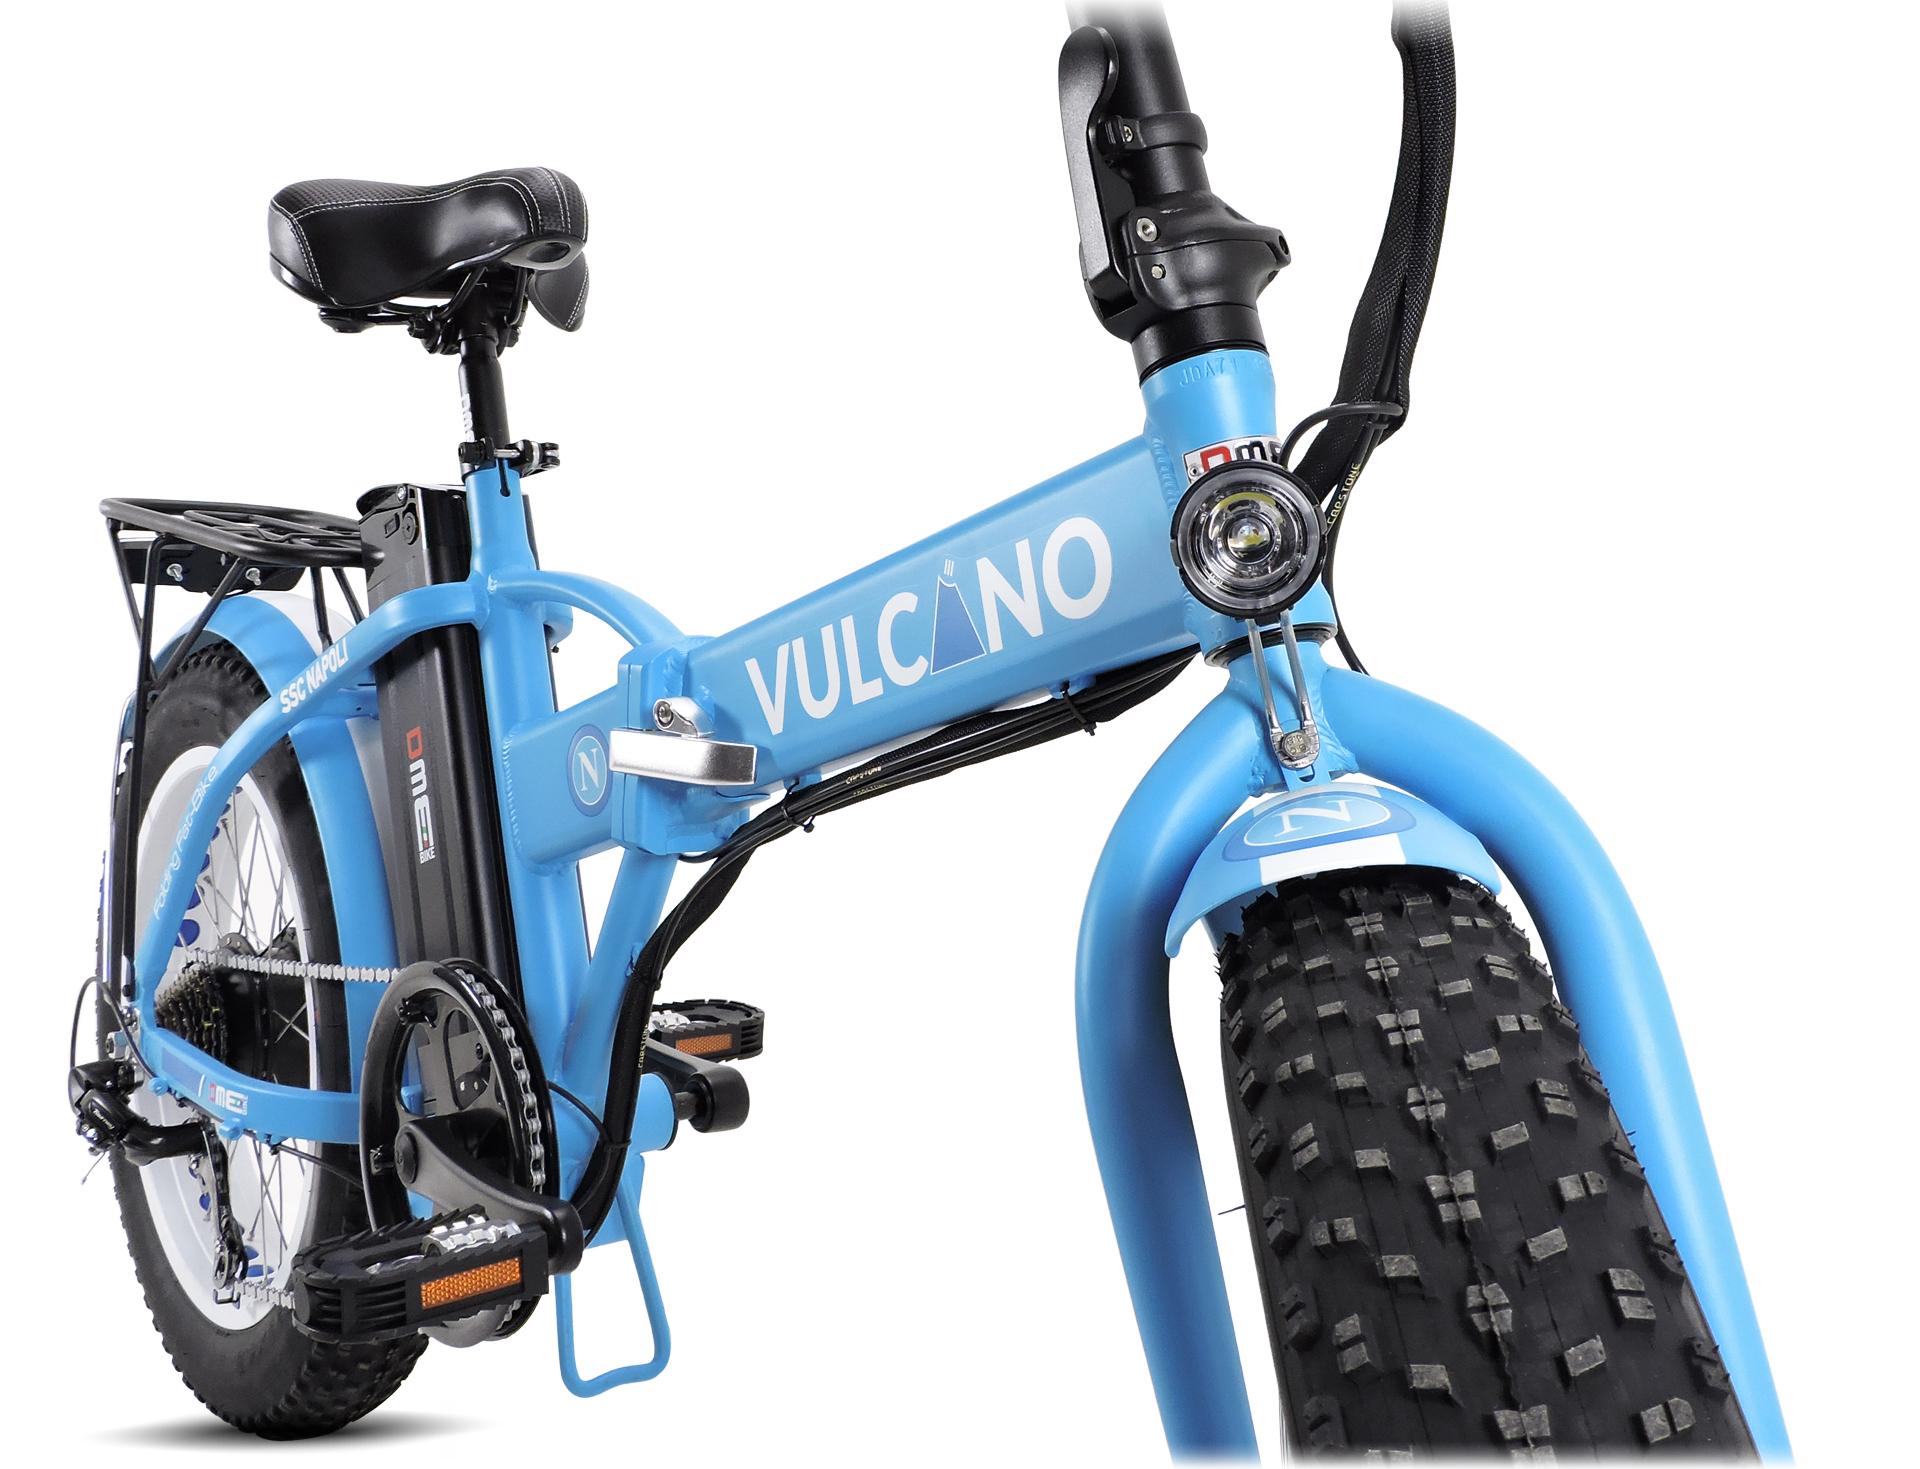 Vulcanov29250w Filtri Dme Autoradiopc Fat Bike 20